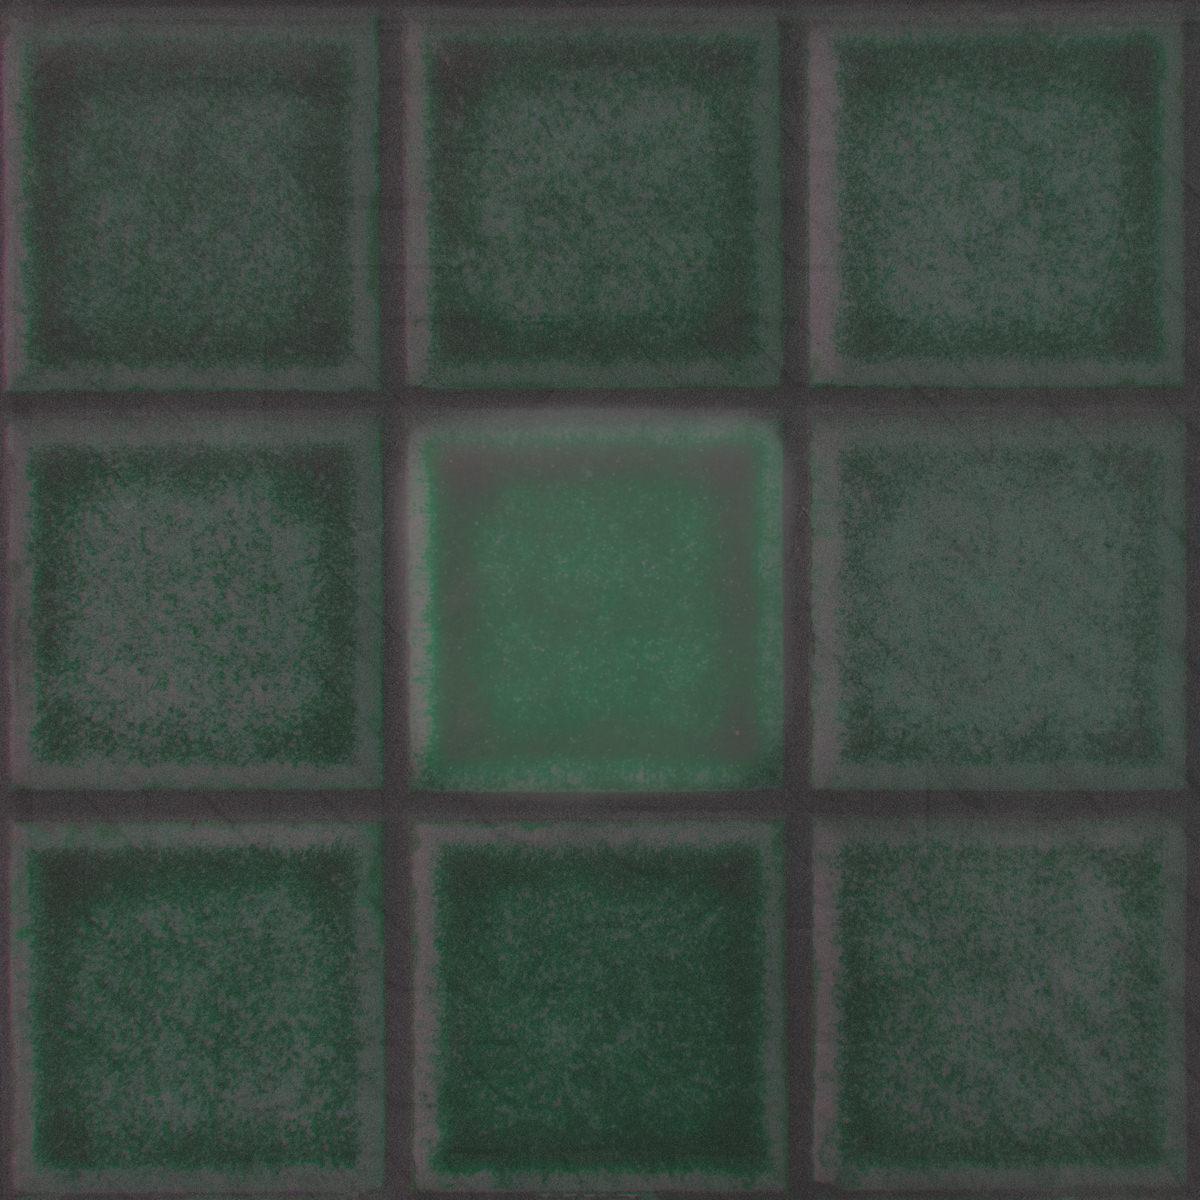 DPS023_2_Square.jpg